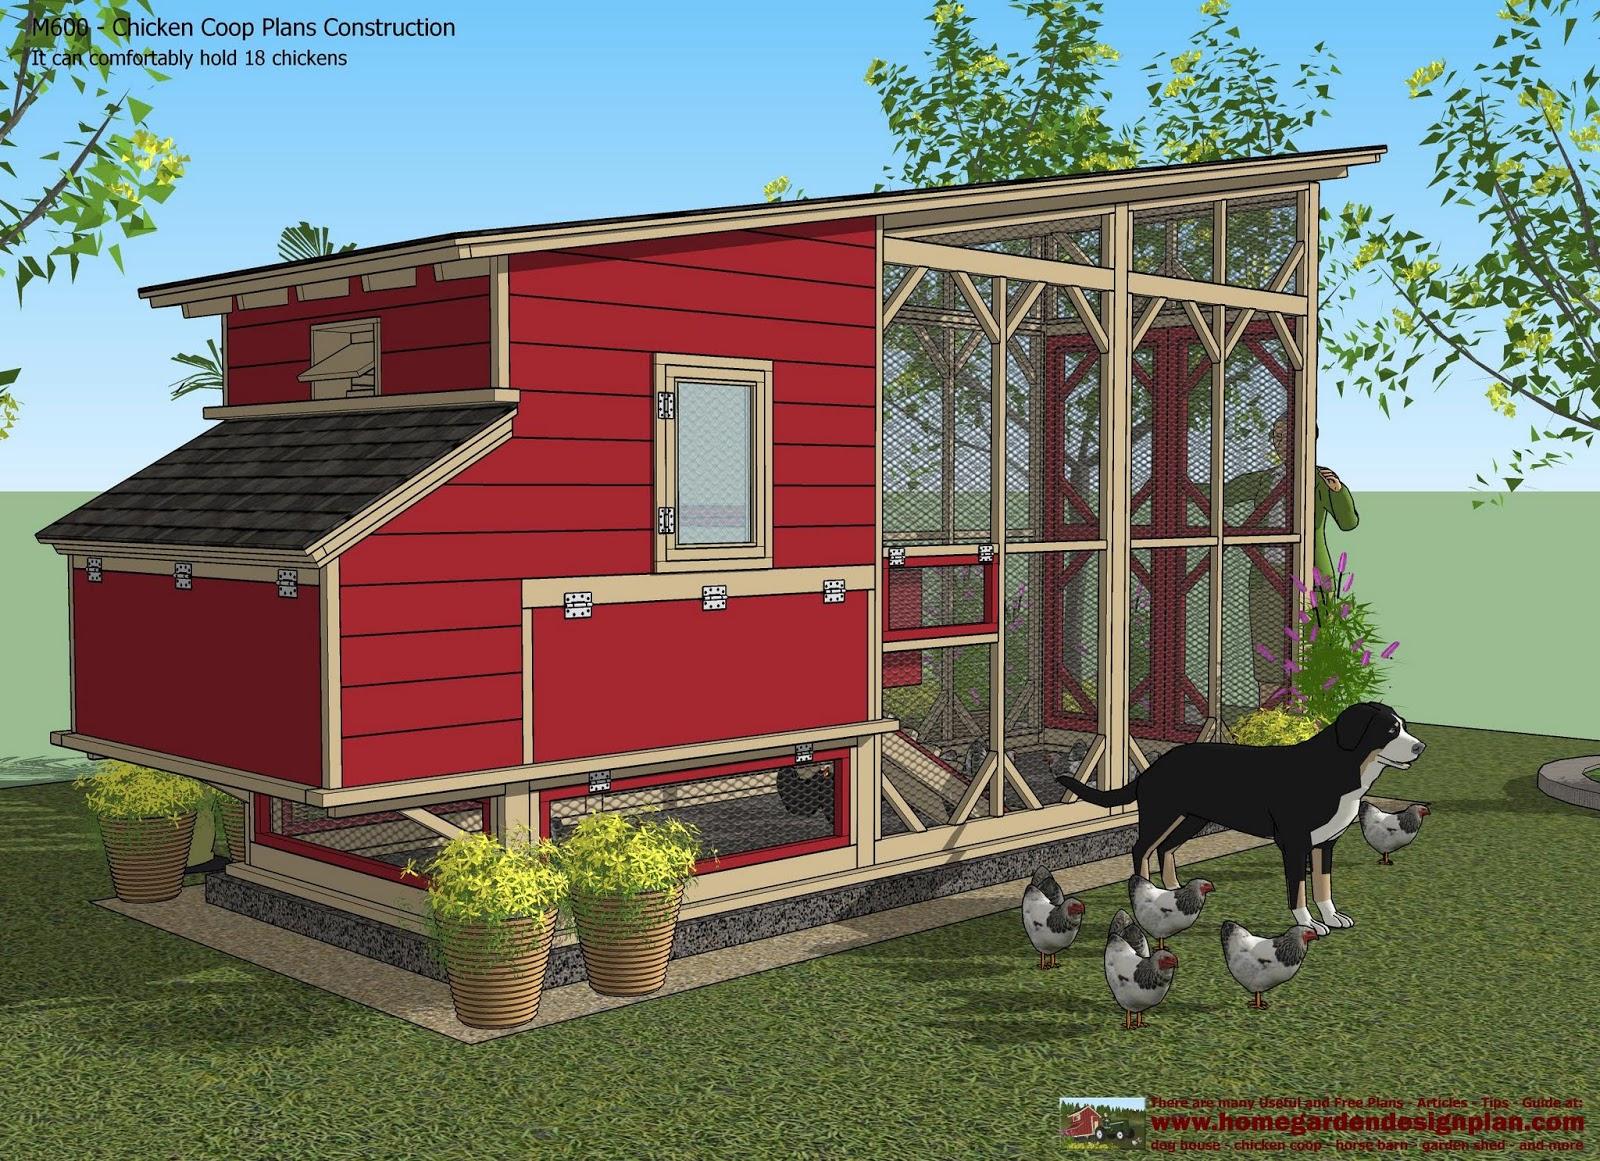 M600 Chicken Coop Plans Construction Chicken Coop Design How To Build ...